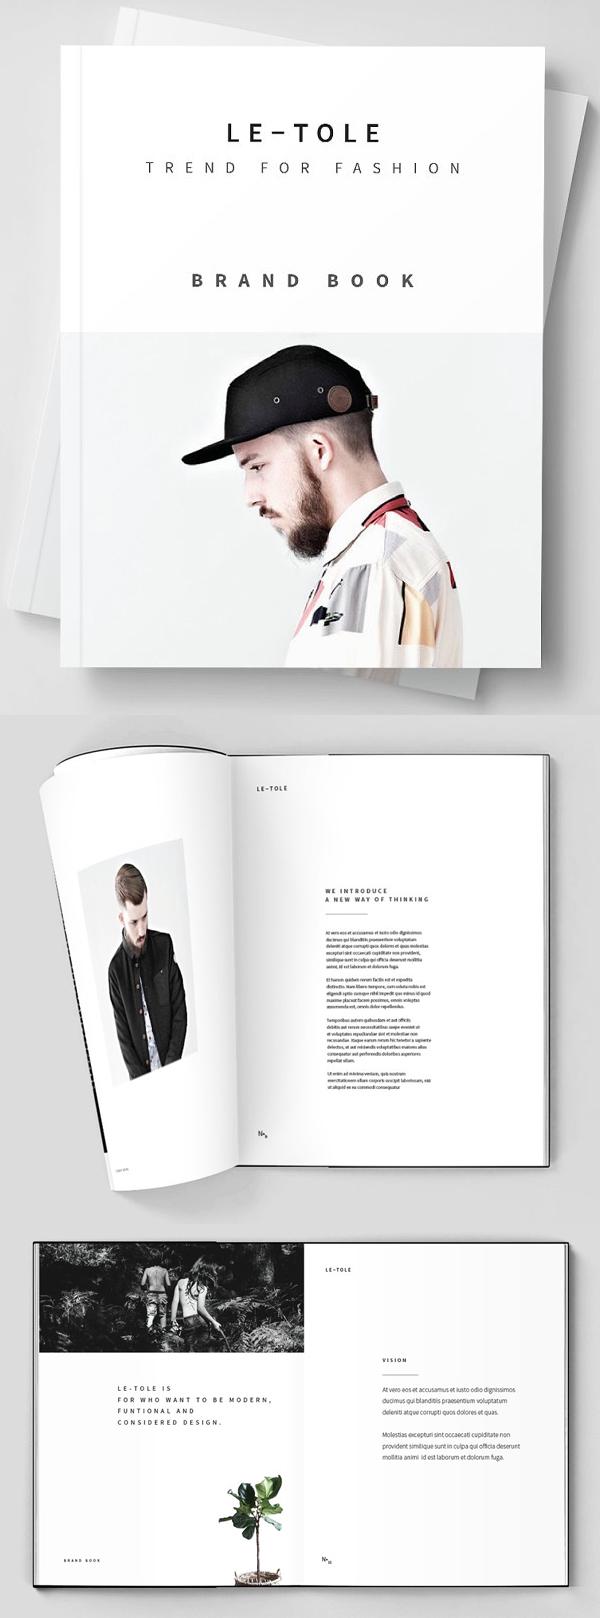 folletos profesionales - marca de moda